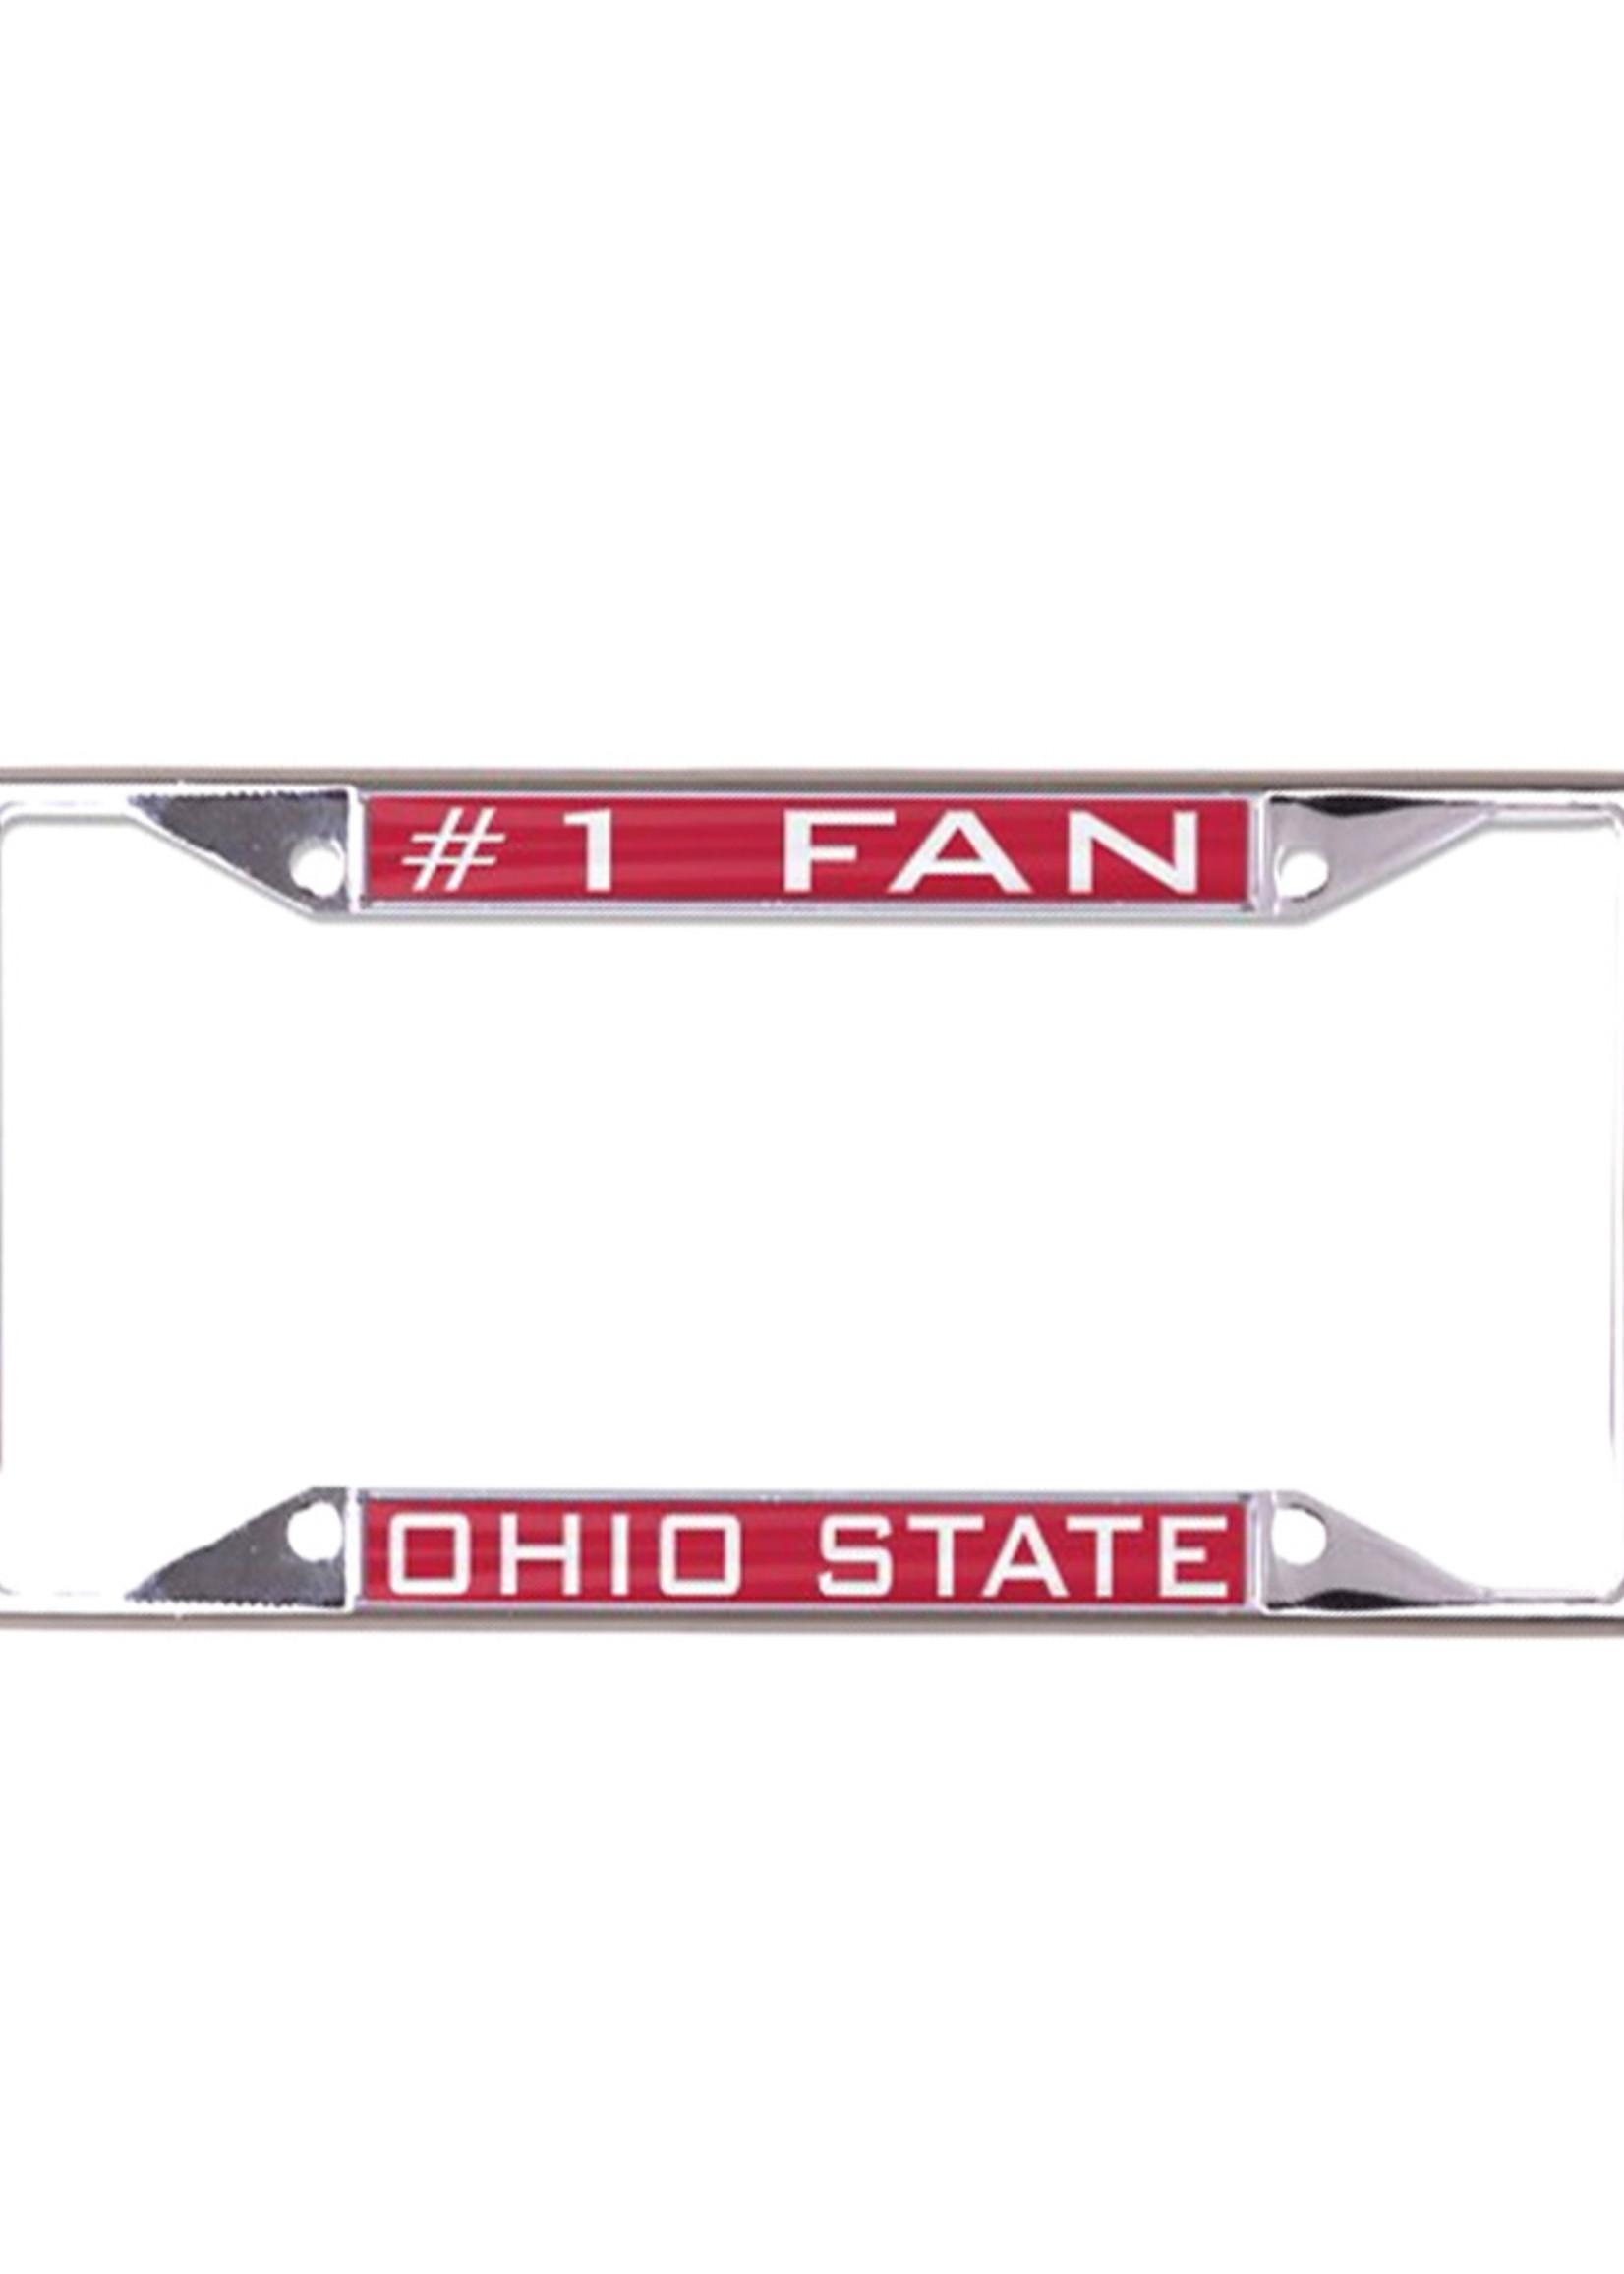 Wincraft Ohio State Buckeyes #1 Fan License Plate Frame